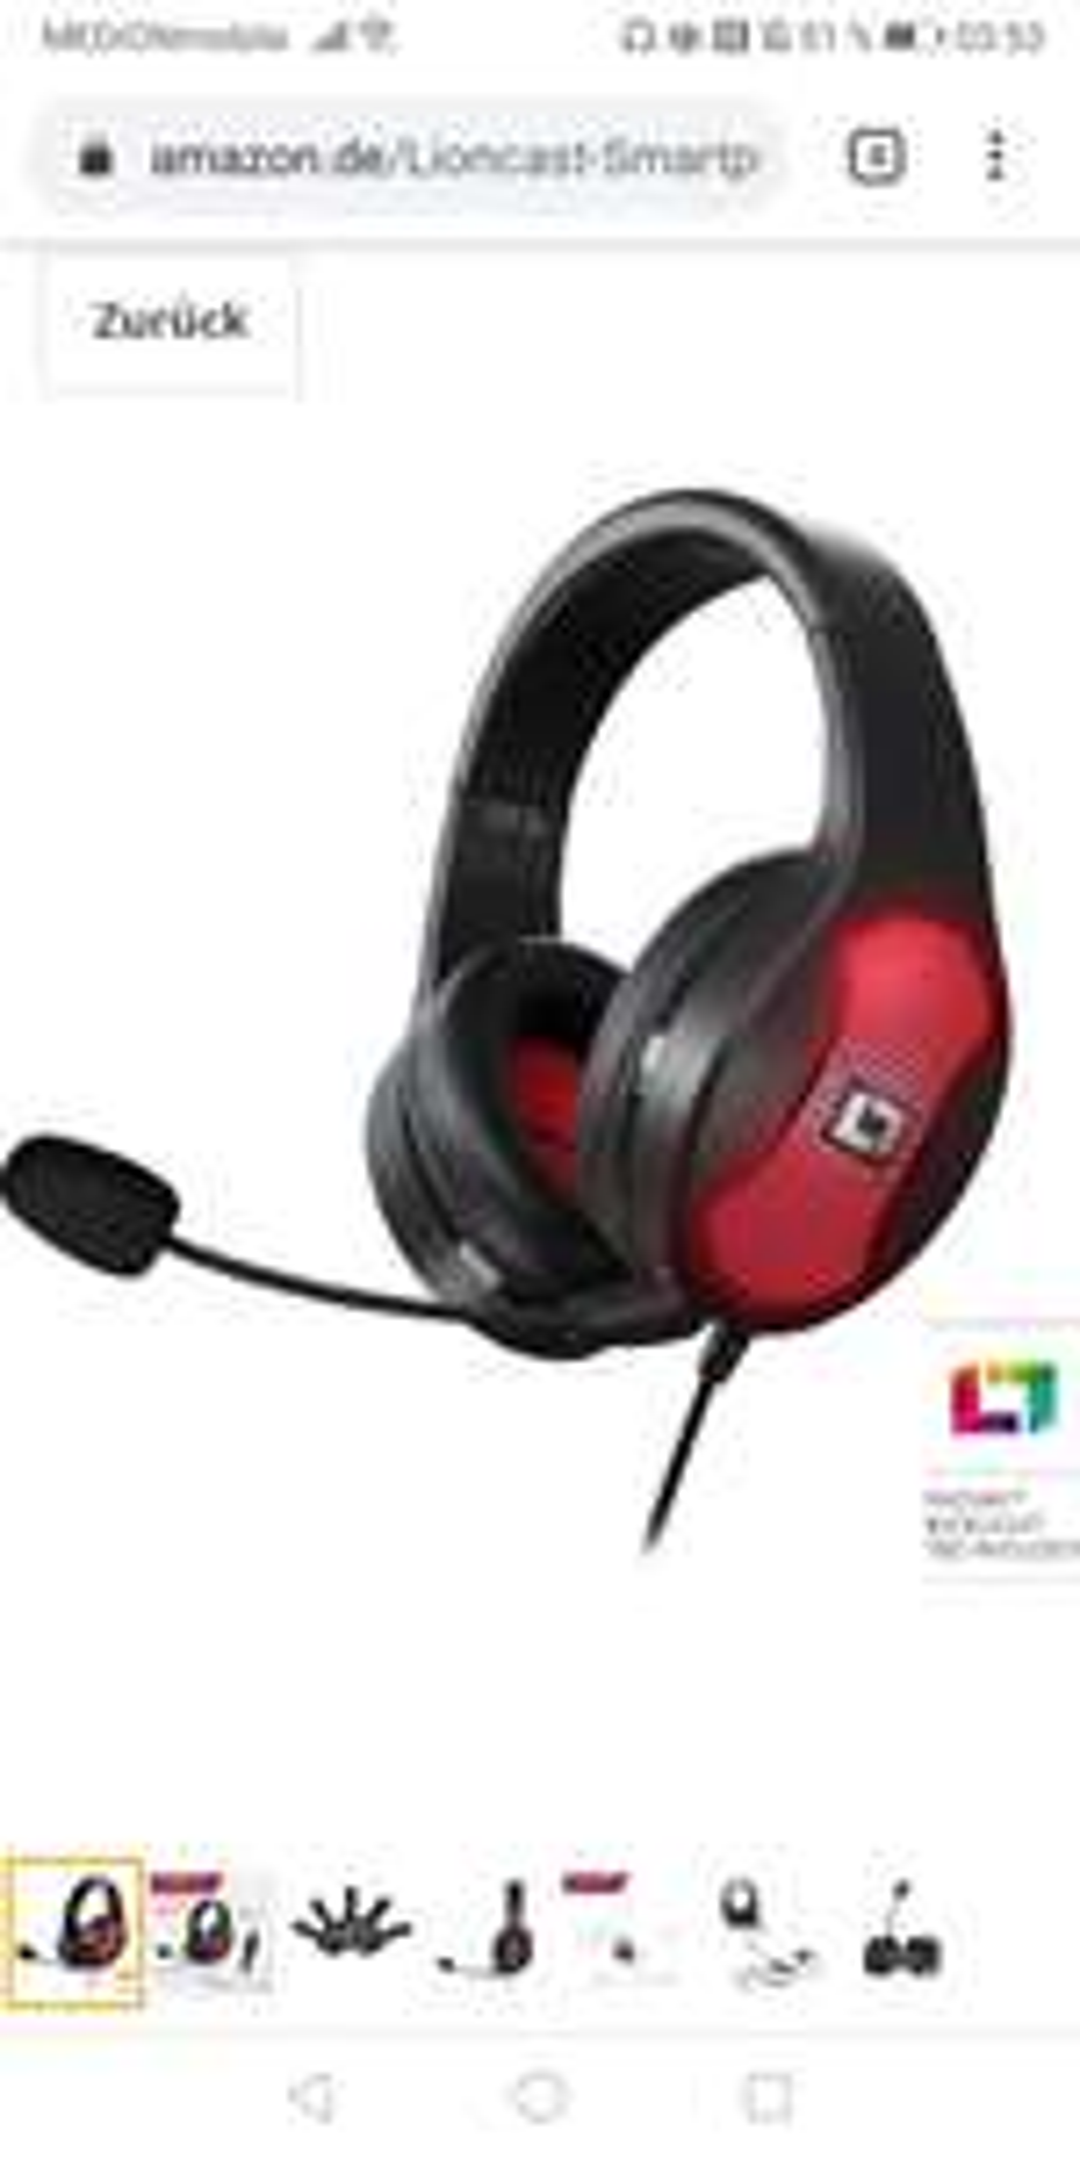 Lioncast LX30 rgb Headset